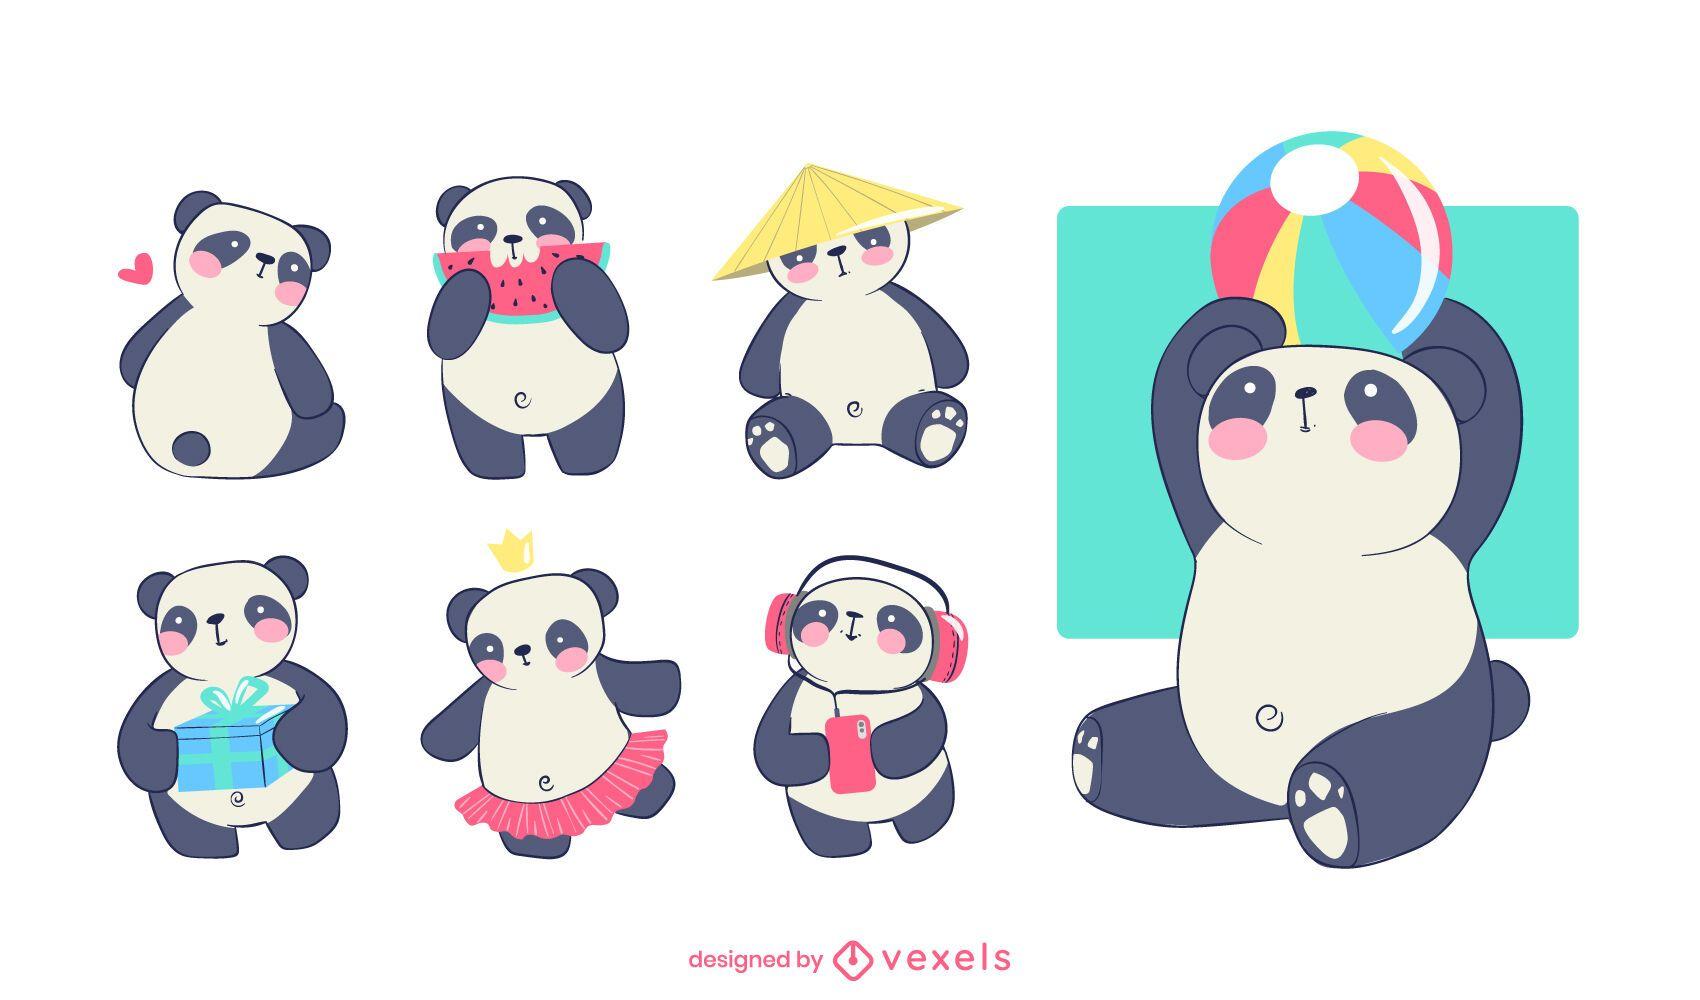 Dise?o de conjunto de personajes de panda lindo